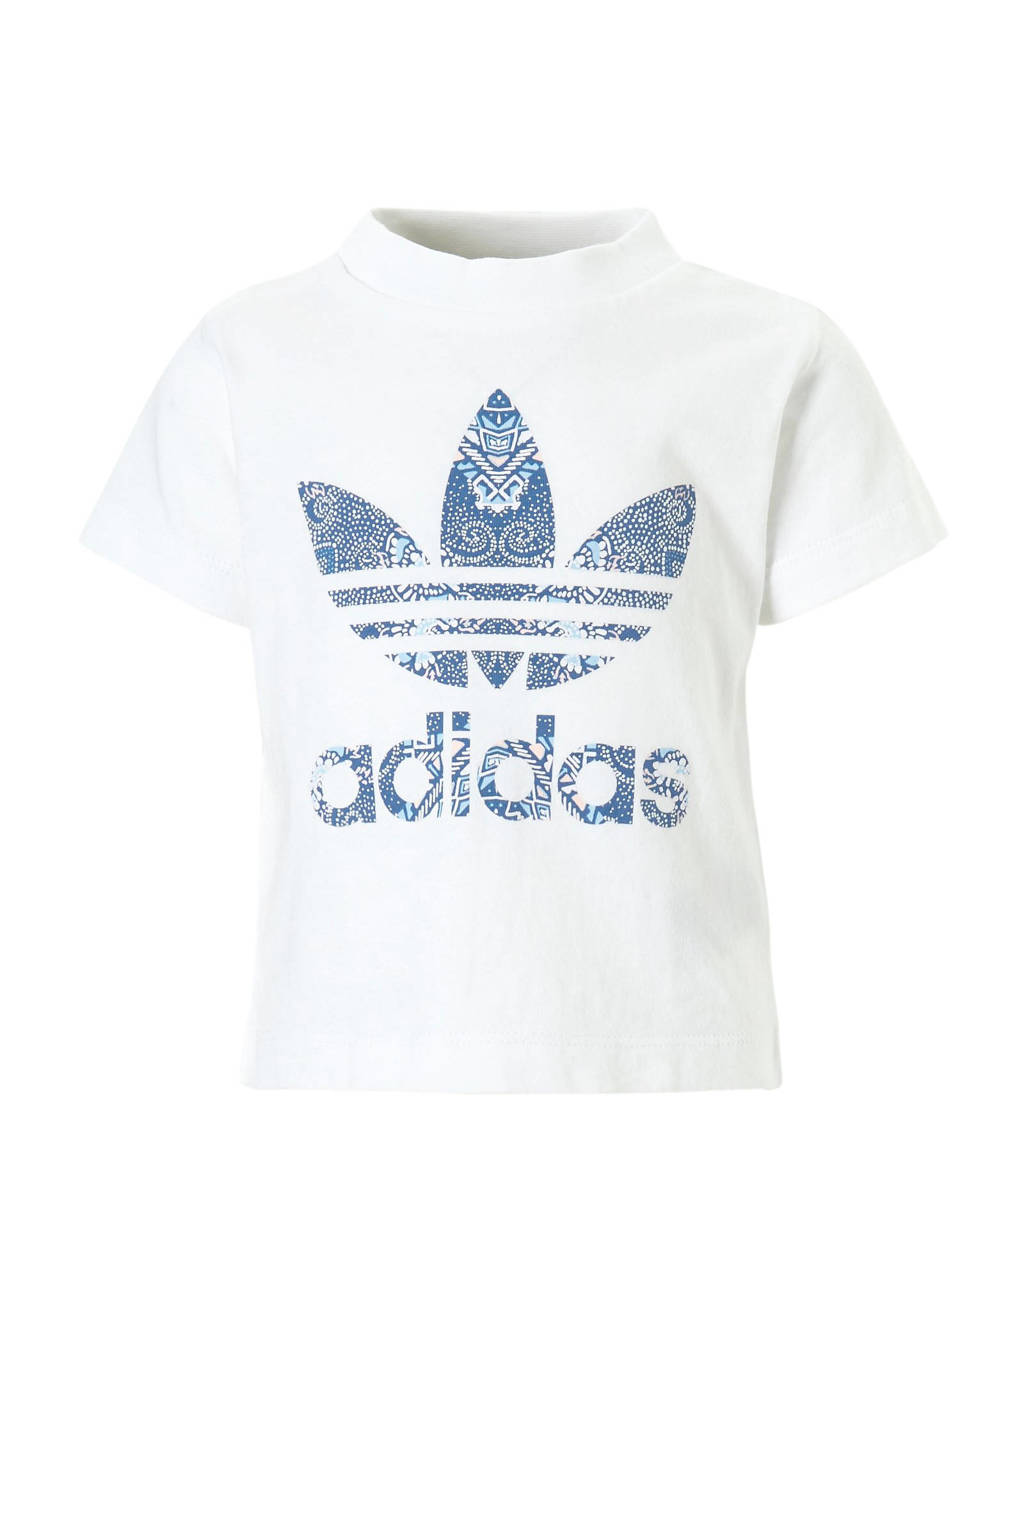 adidas originals T-shirt, Wit/blauw